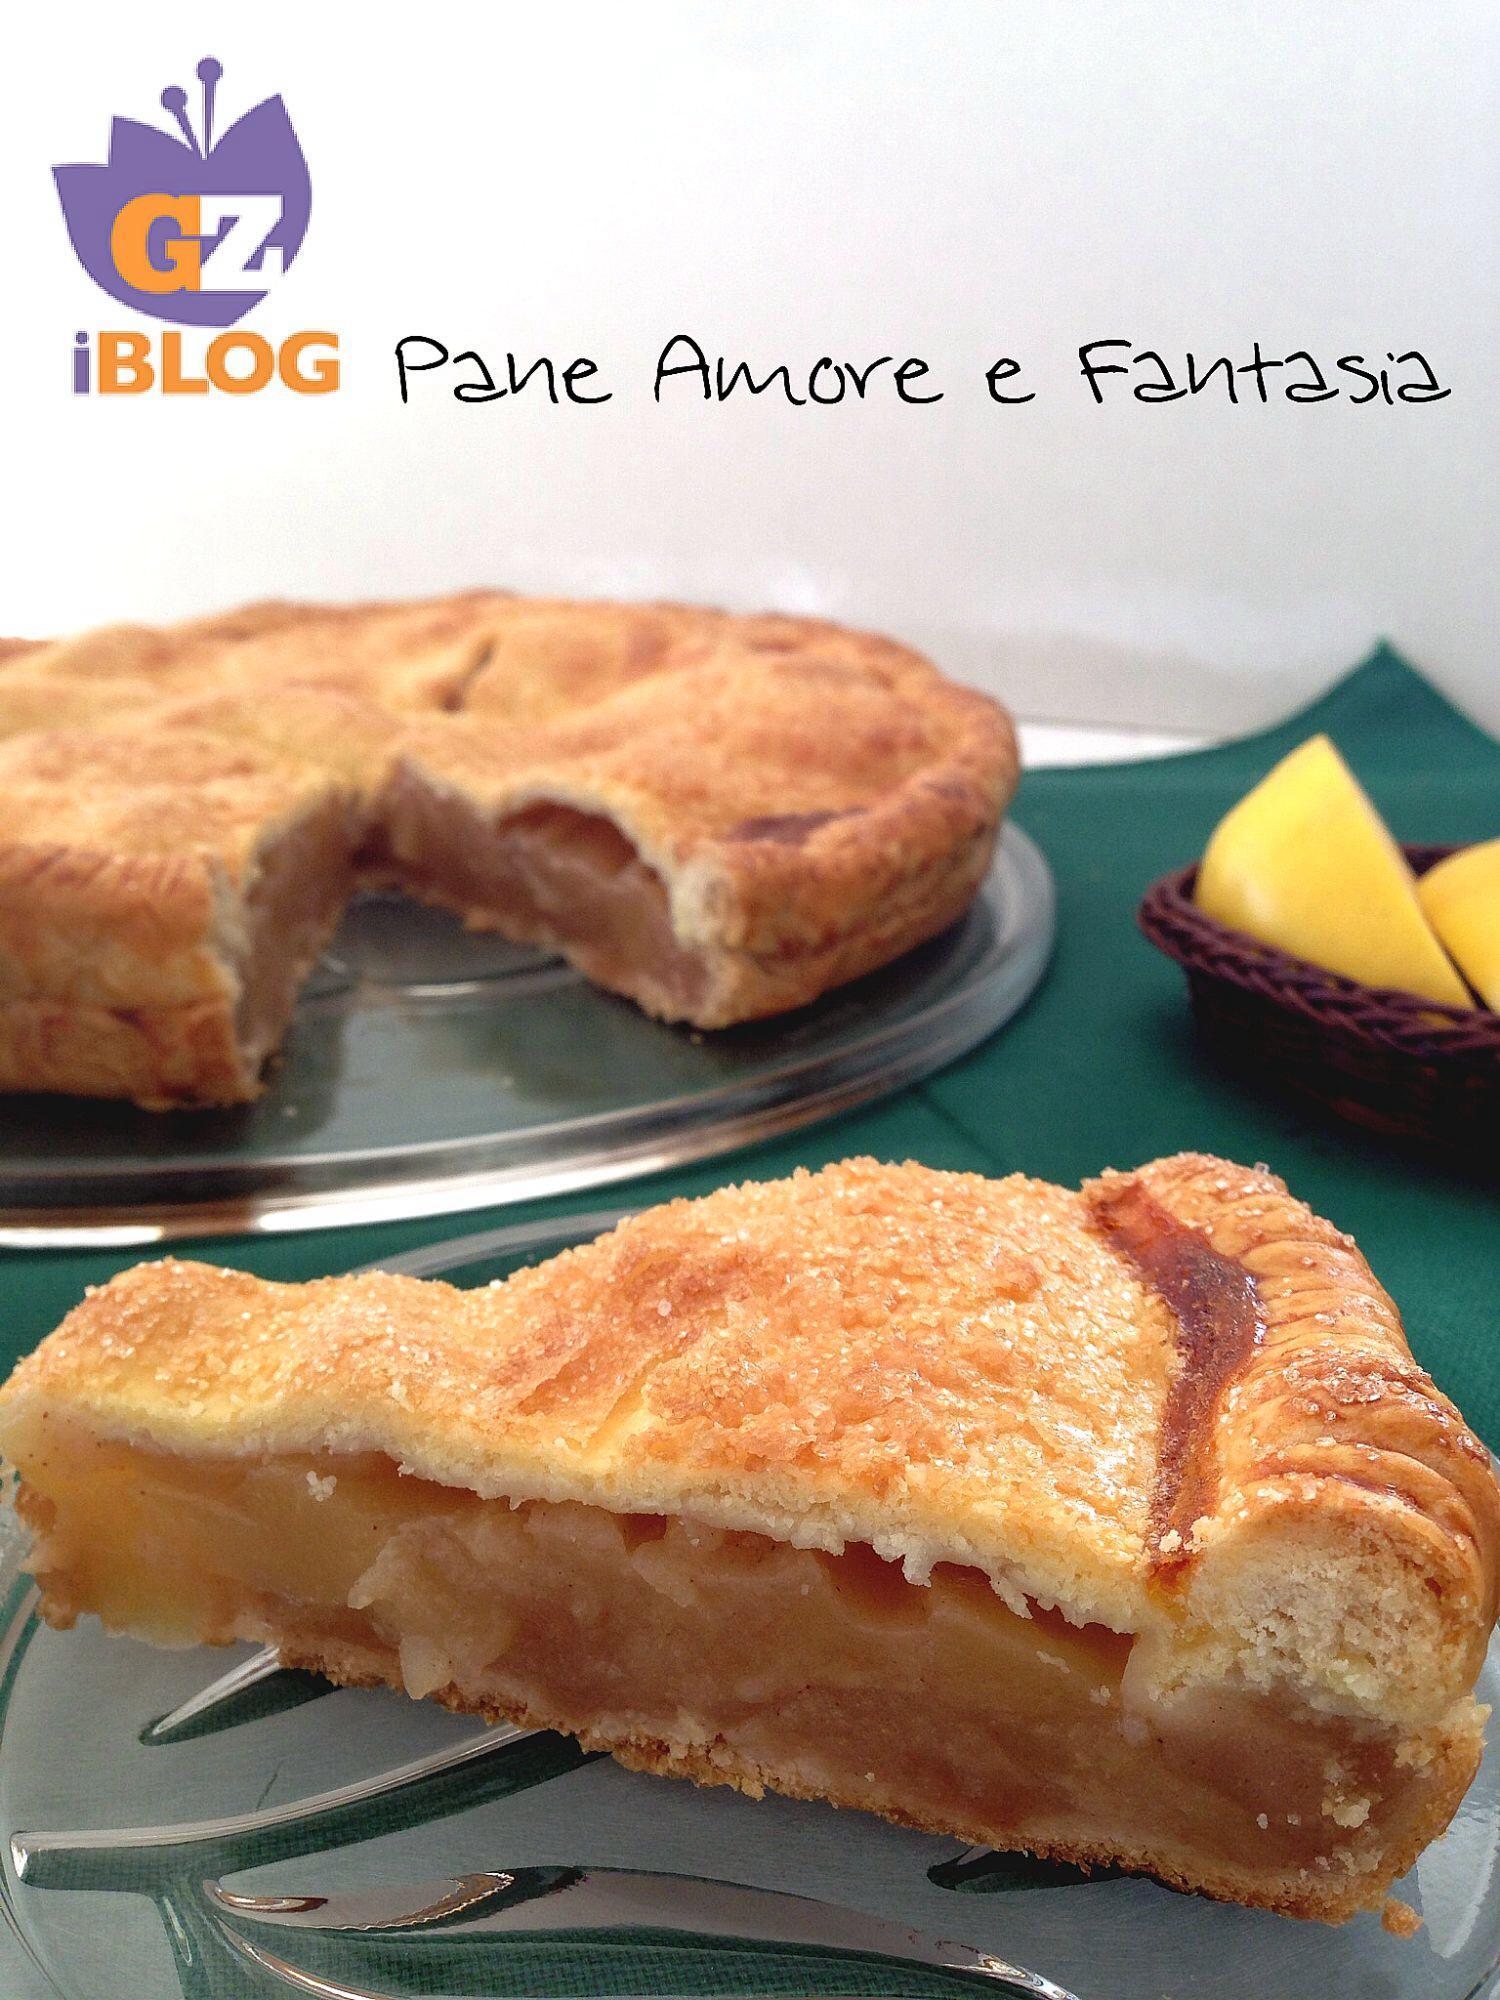 Ricetta Torta Di Mele Americana.Apple Pie Torta Di Mele Americana Ricetta Originale Pane Amore E Fantasia